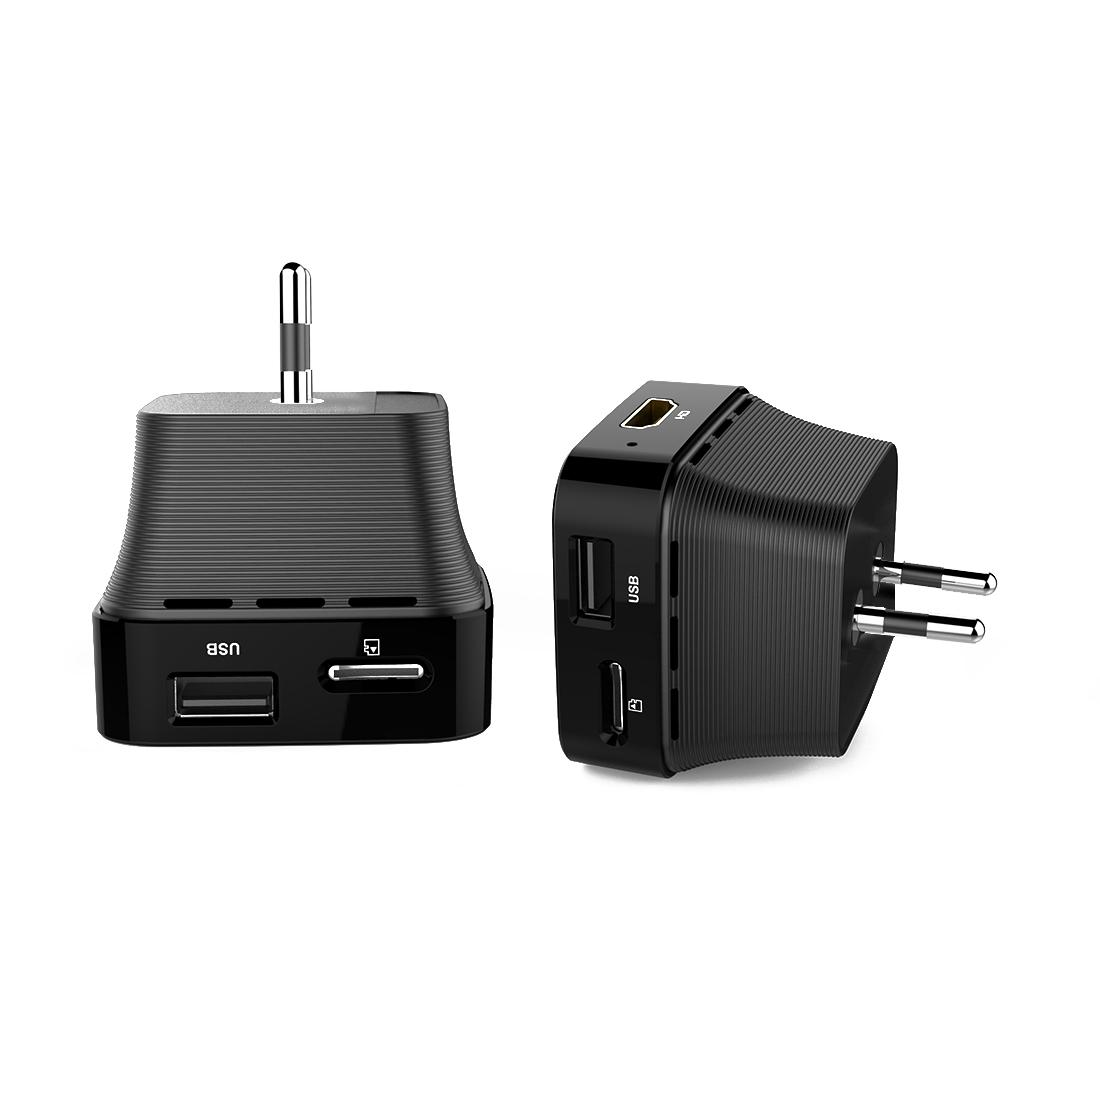 T95P TV BOX Mini Media center Amlogic S905X RK3229 factory manufacturer yatay 4